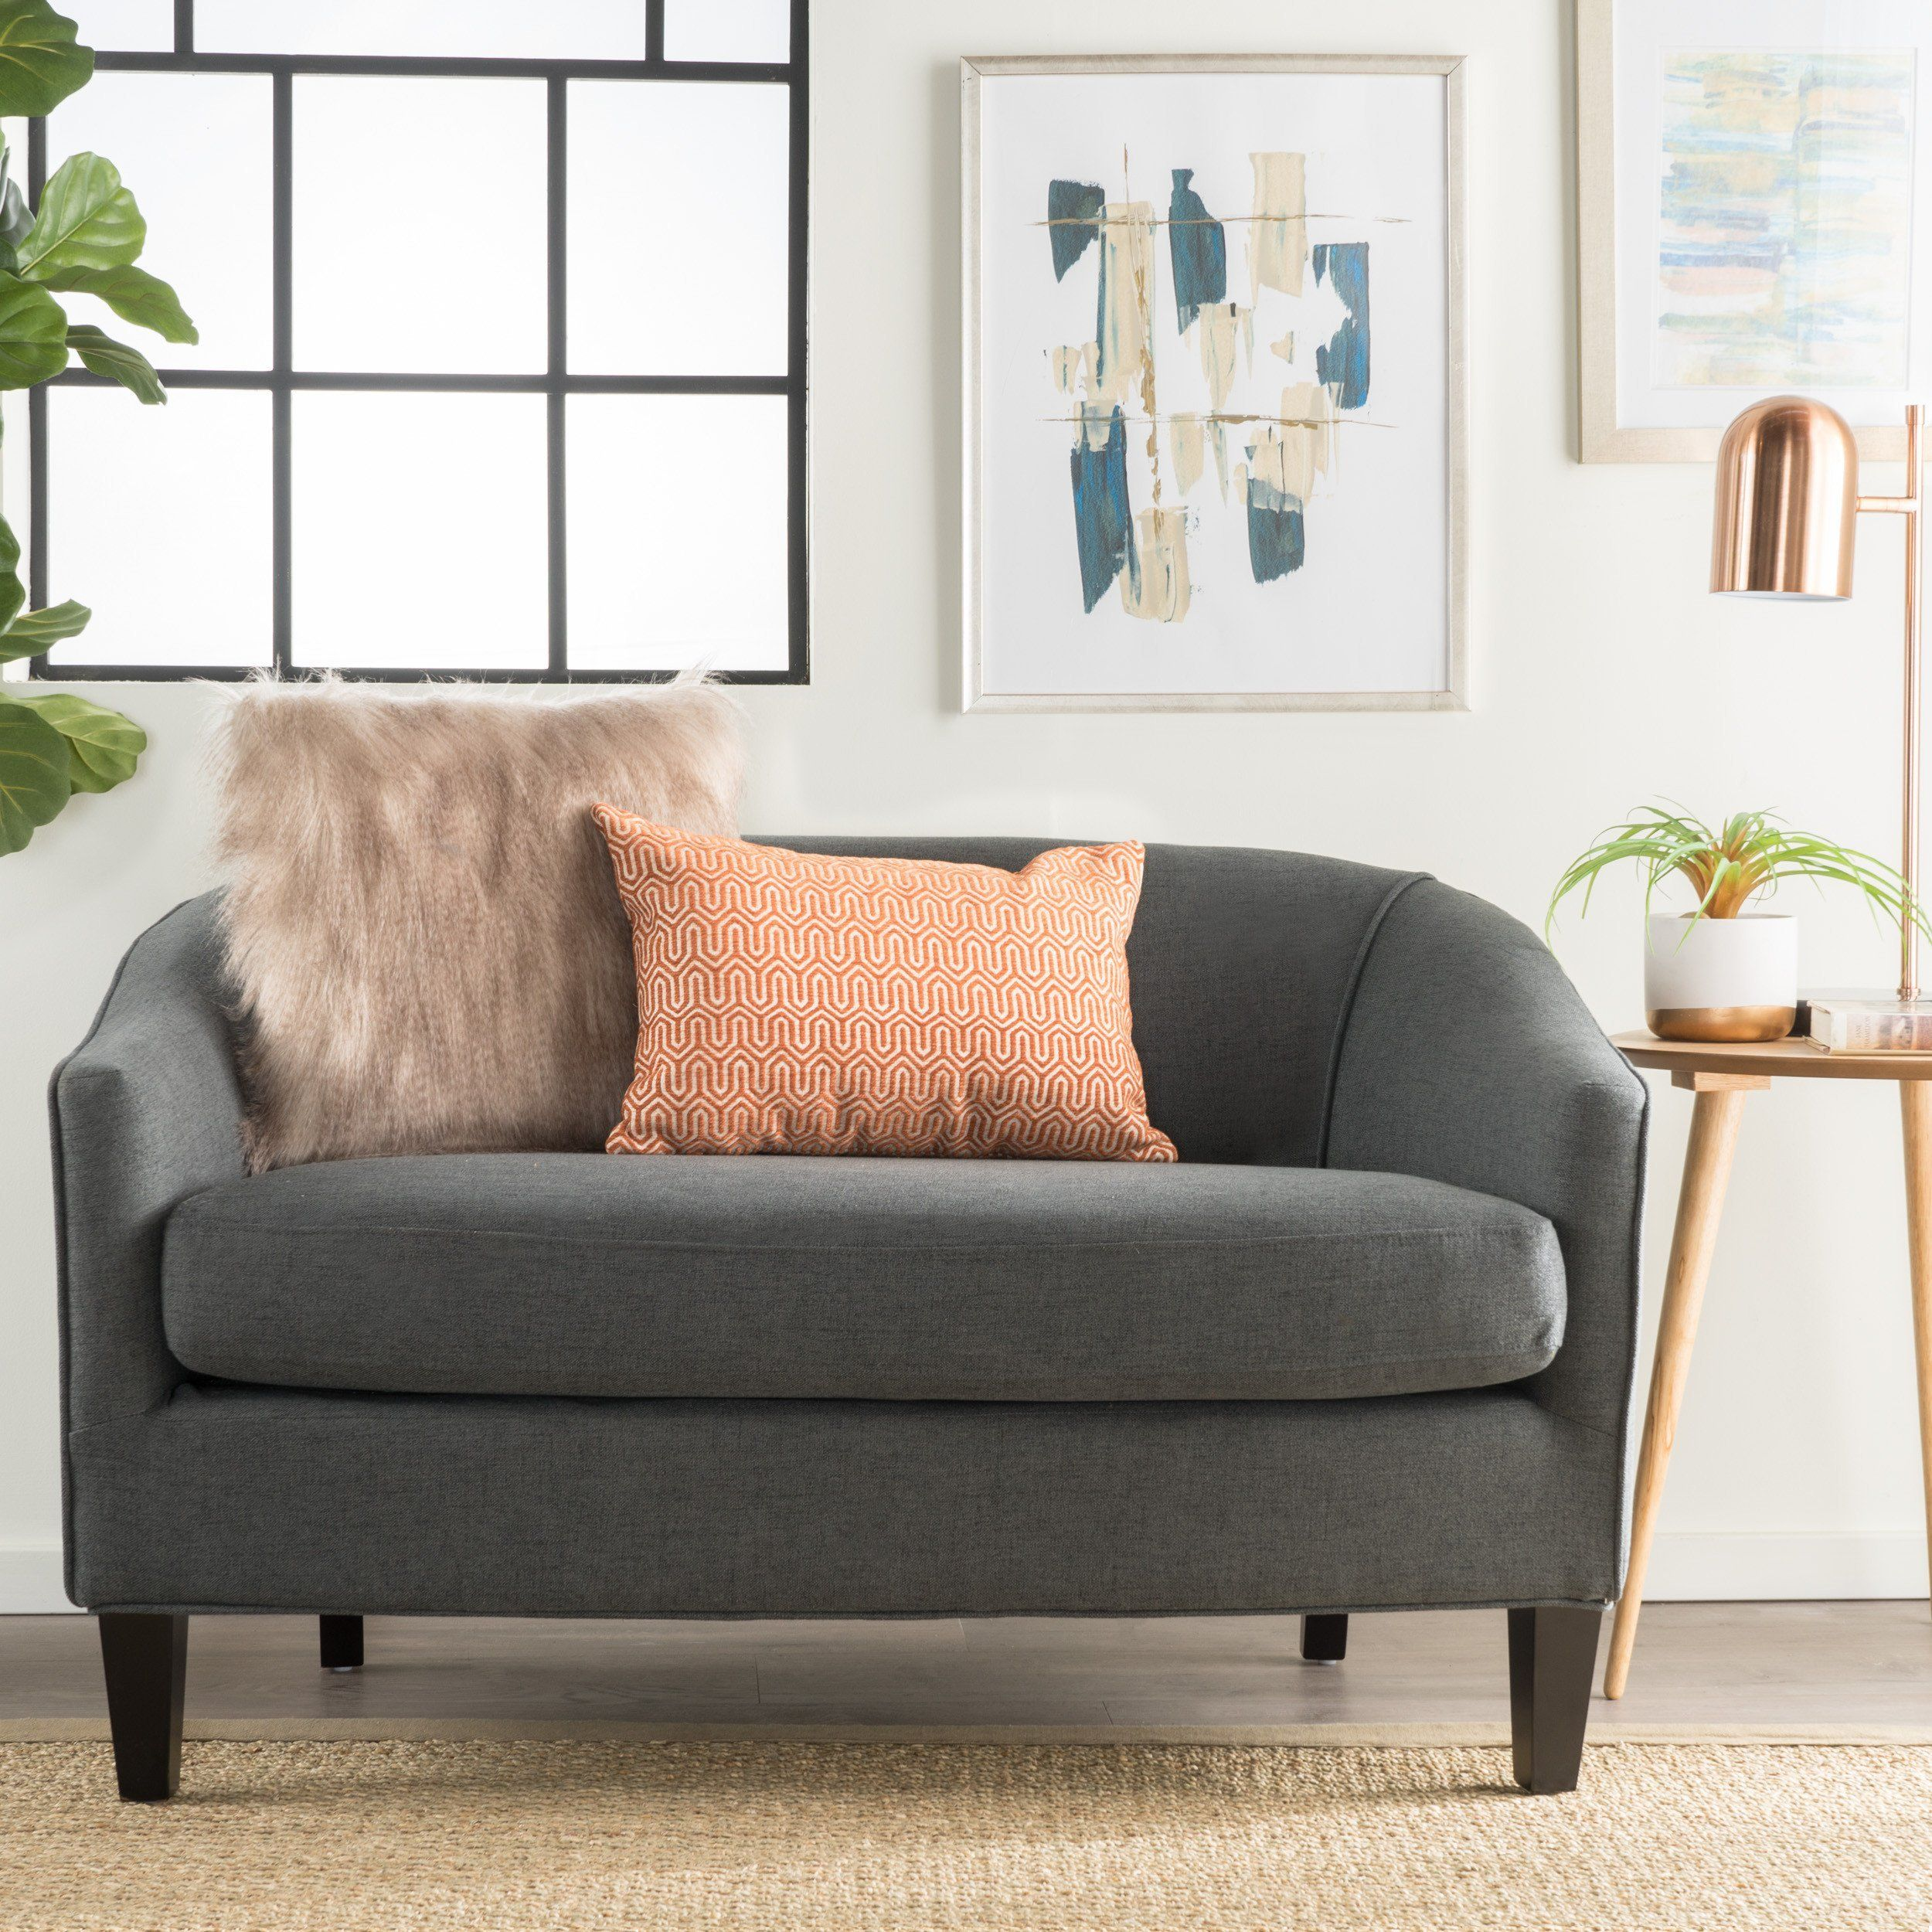 colour loveseats sofa two comfy and seater pop original retro sofas snuggler petite loveseat tone armchairs